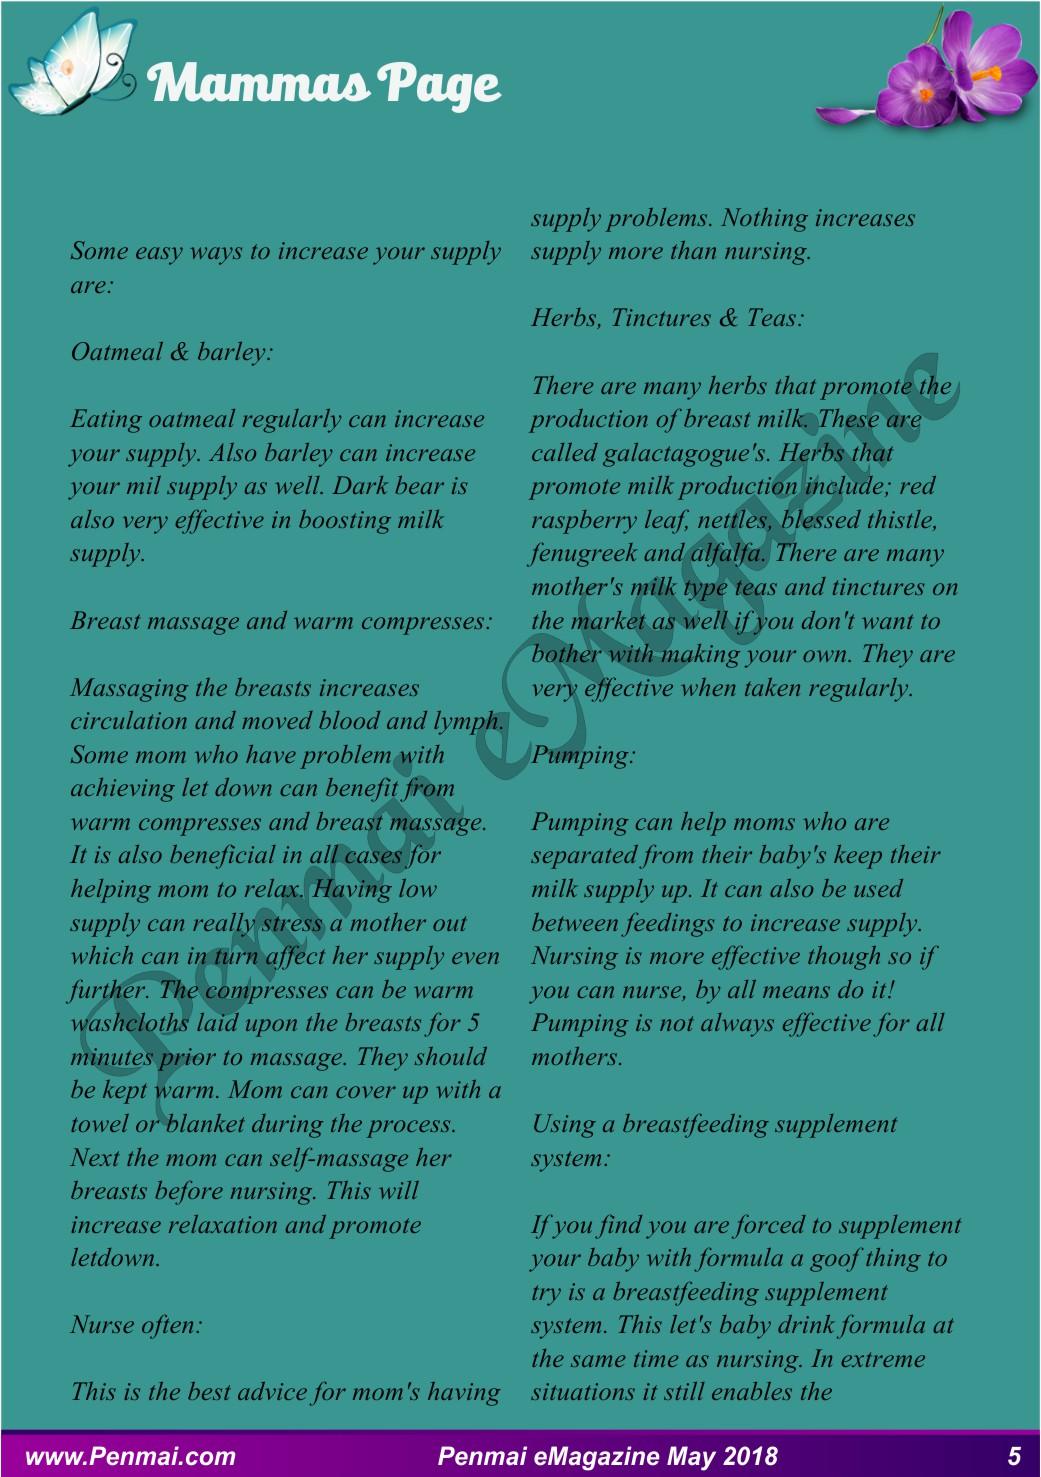 Penmai-eMagazine-May-2018-5.jpg